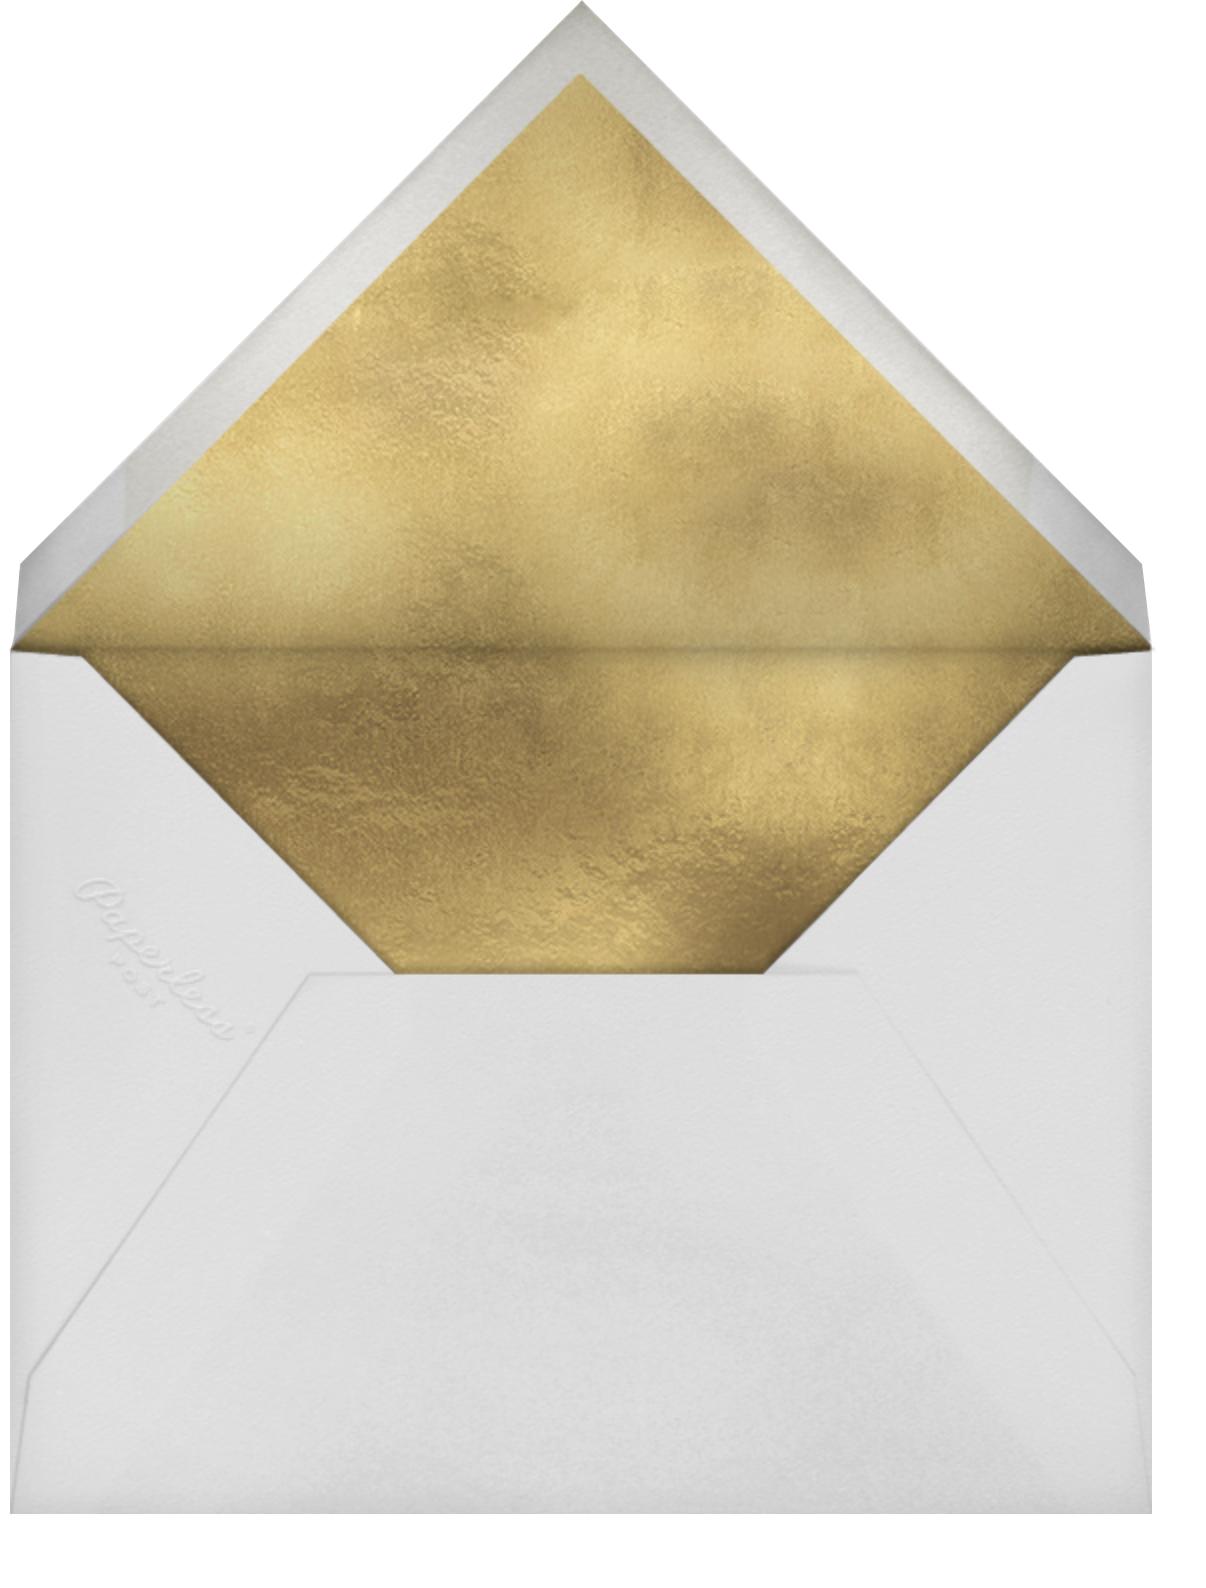 Illusion - Jonathan Adler - Envelope